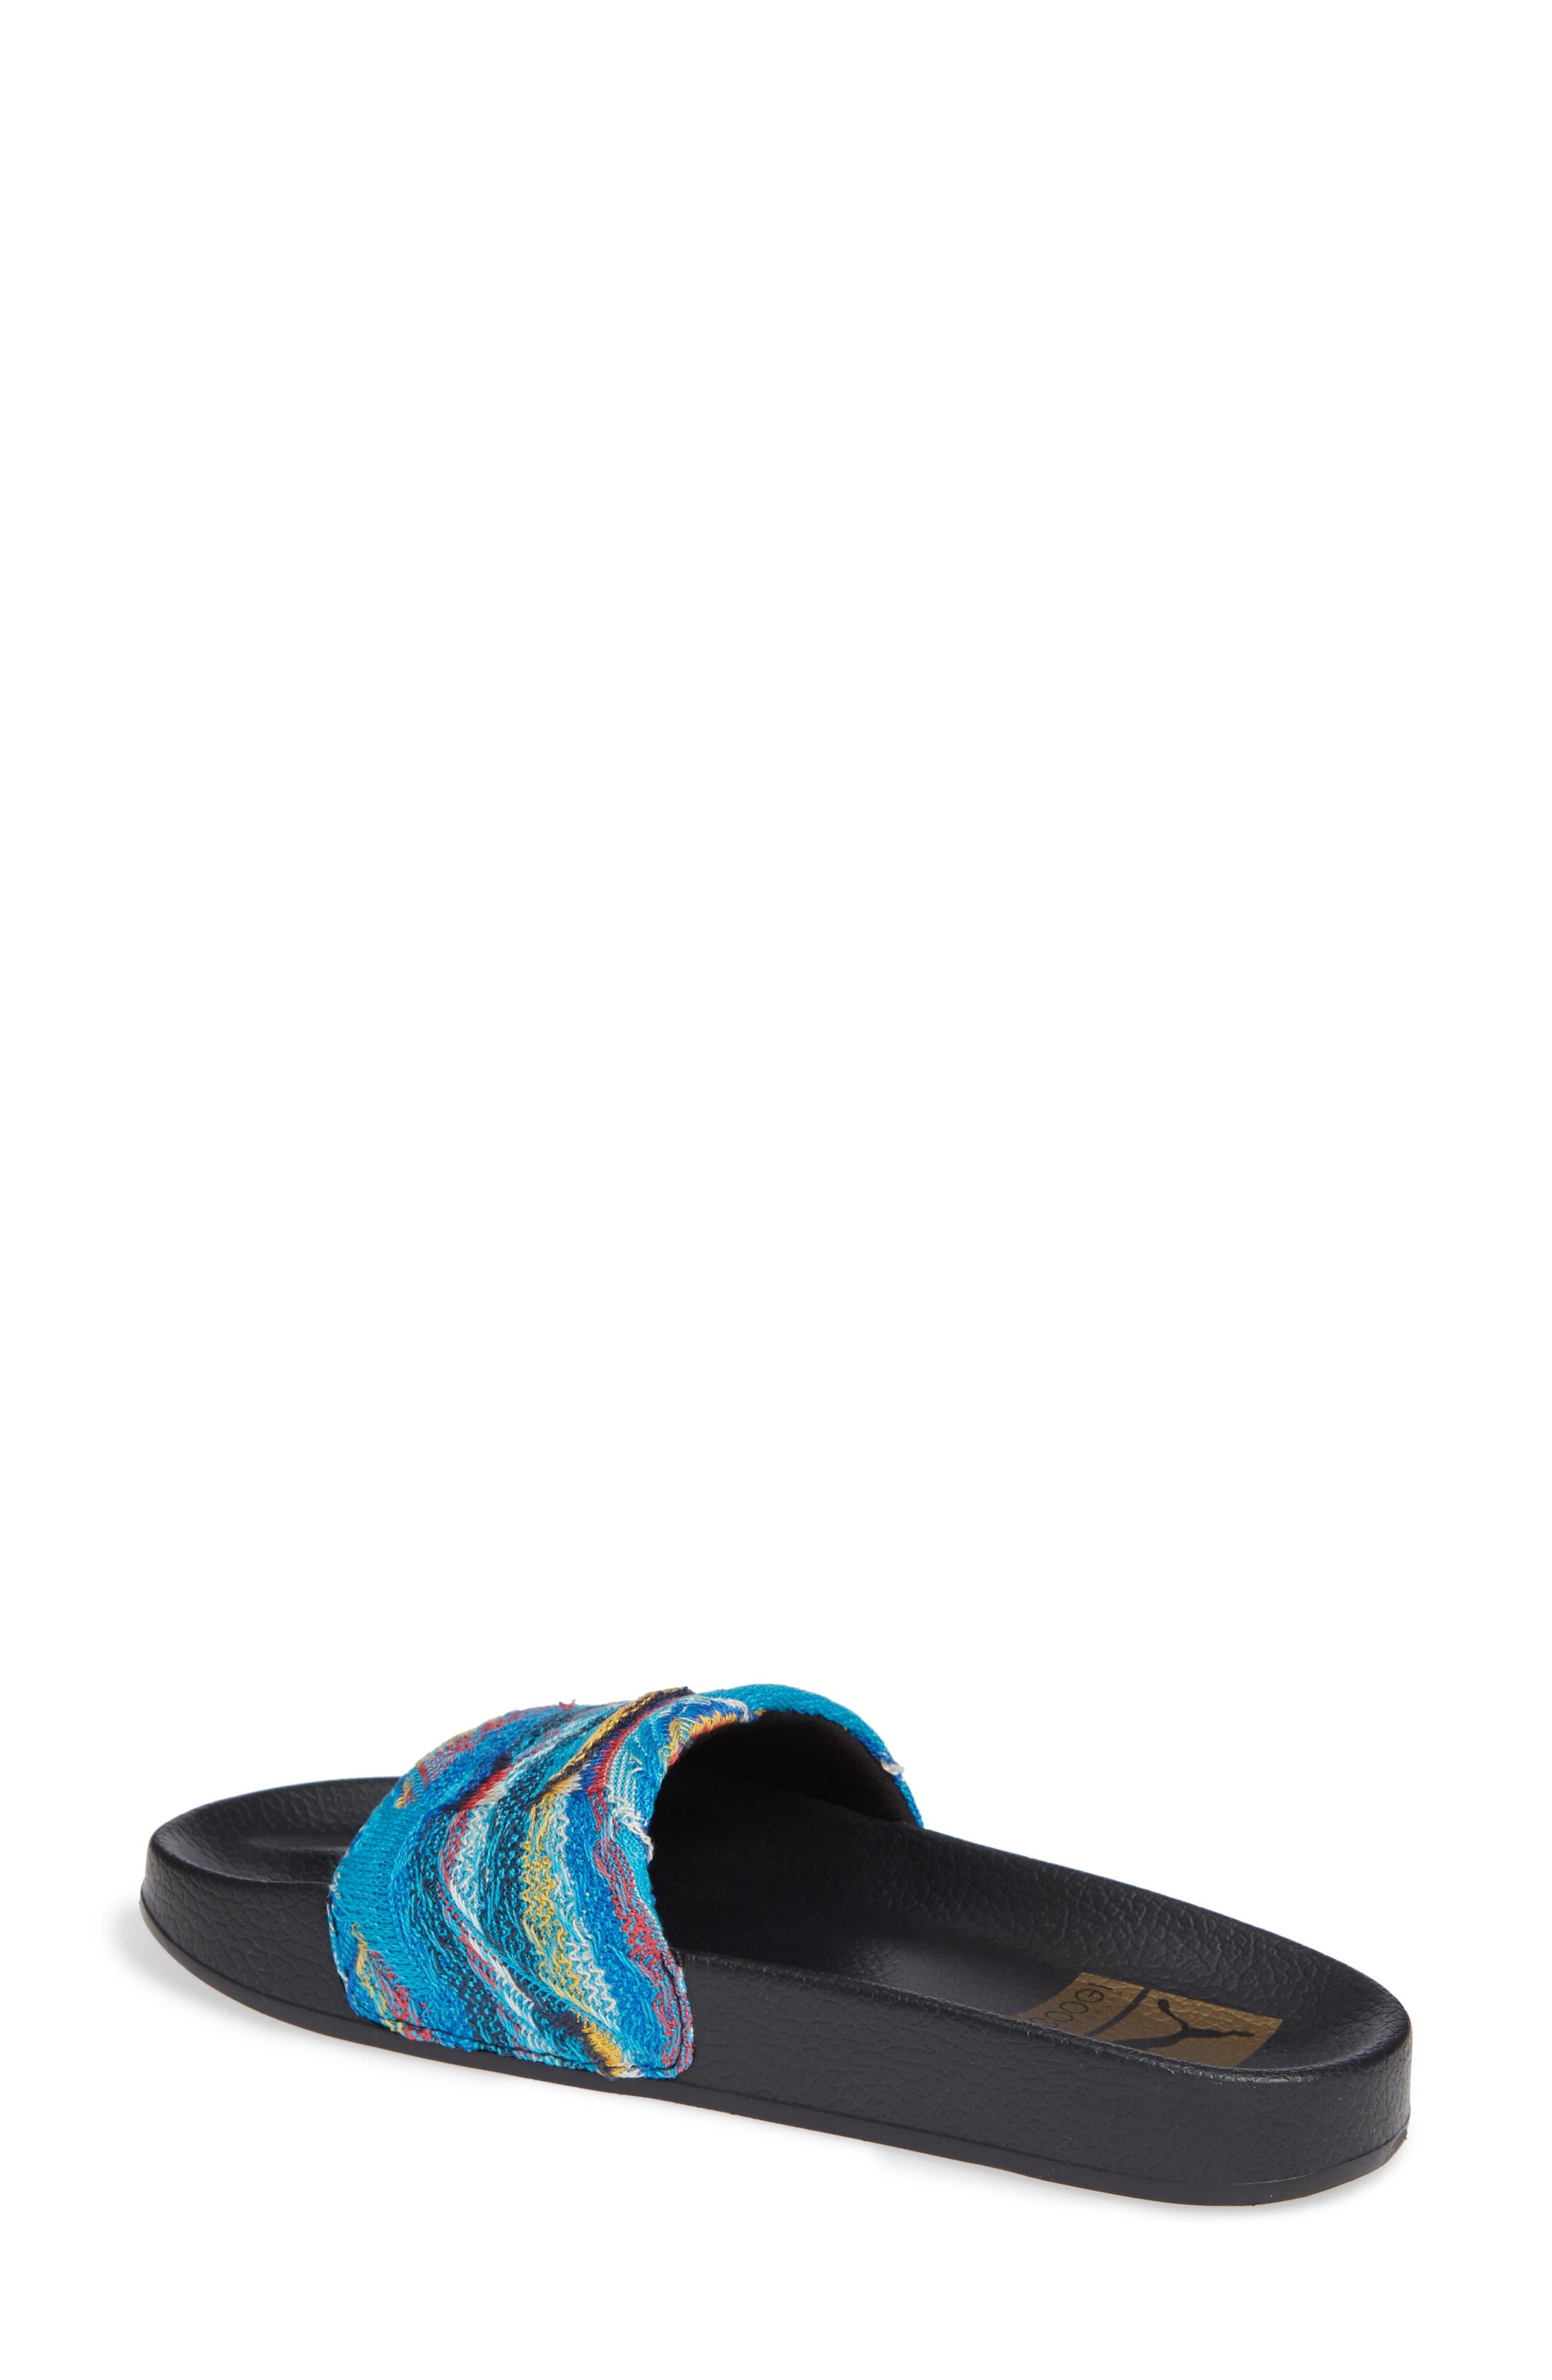 Leadcat Coogie Slide Sandal,                             Alternate thumbnail 2, color,                             ISLAND PARADISE/ PUMA BLACK